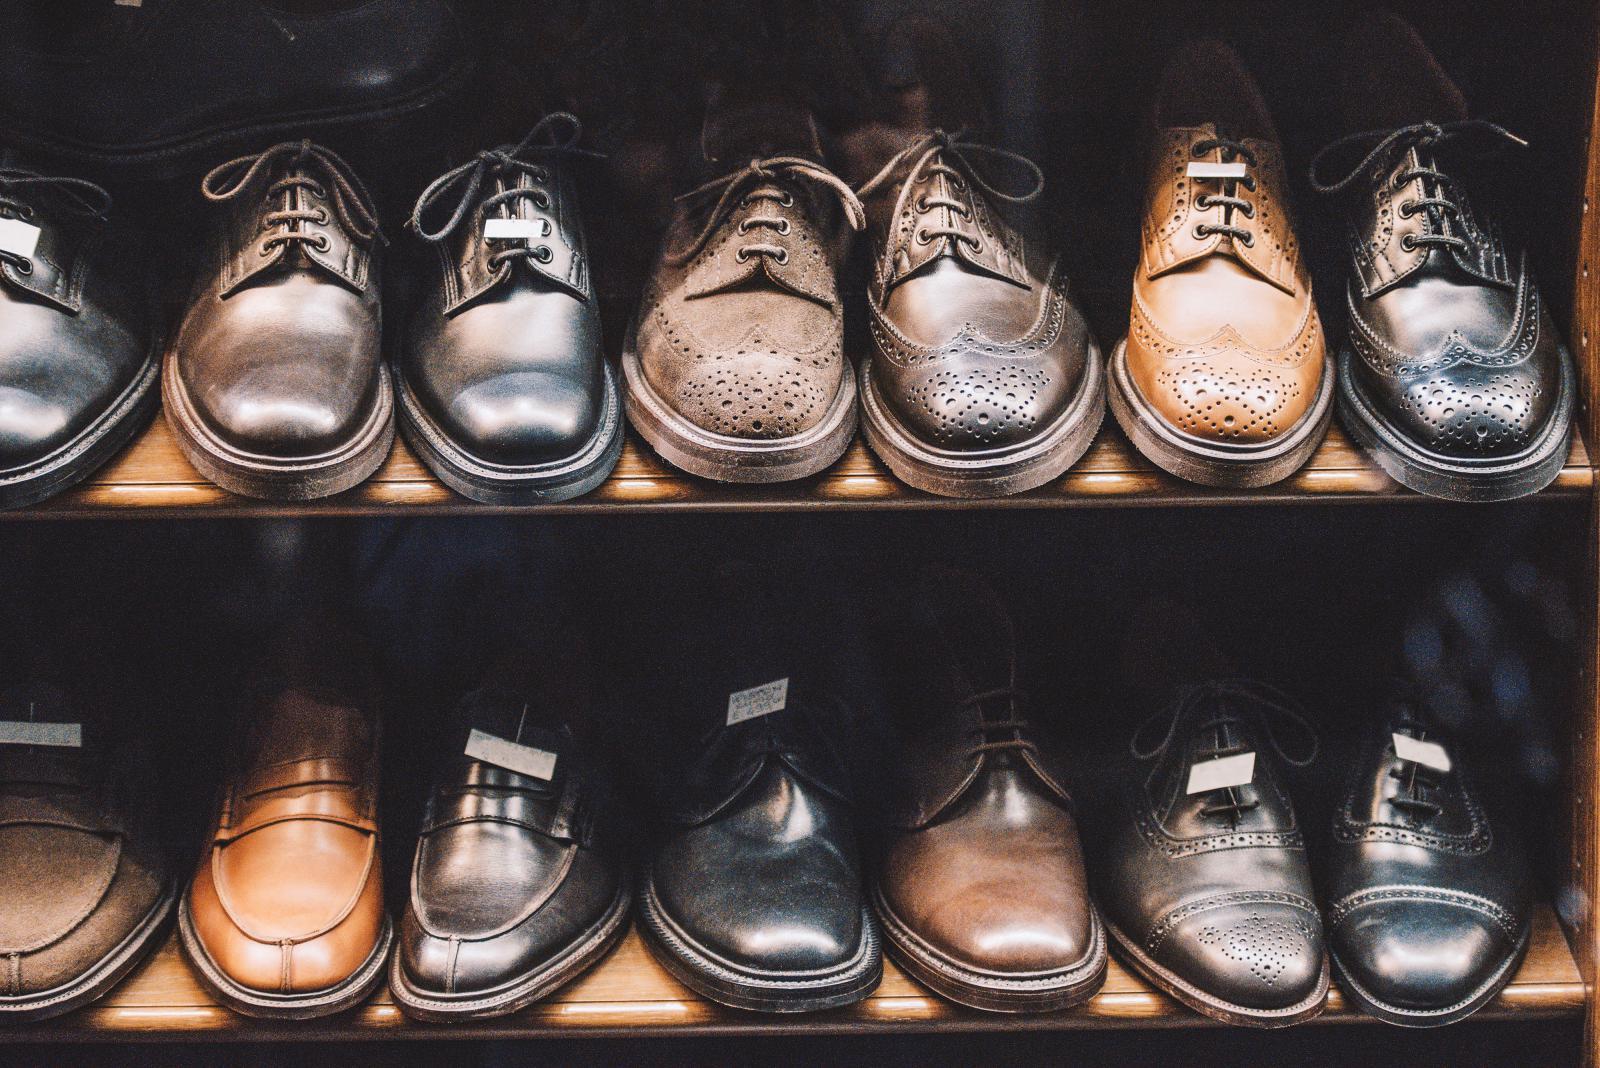 Scarpe artigianali da uomo